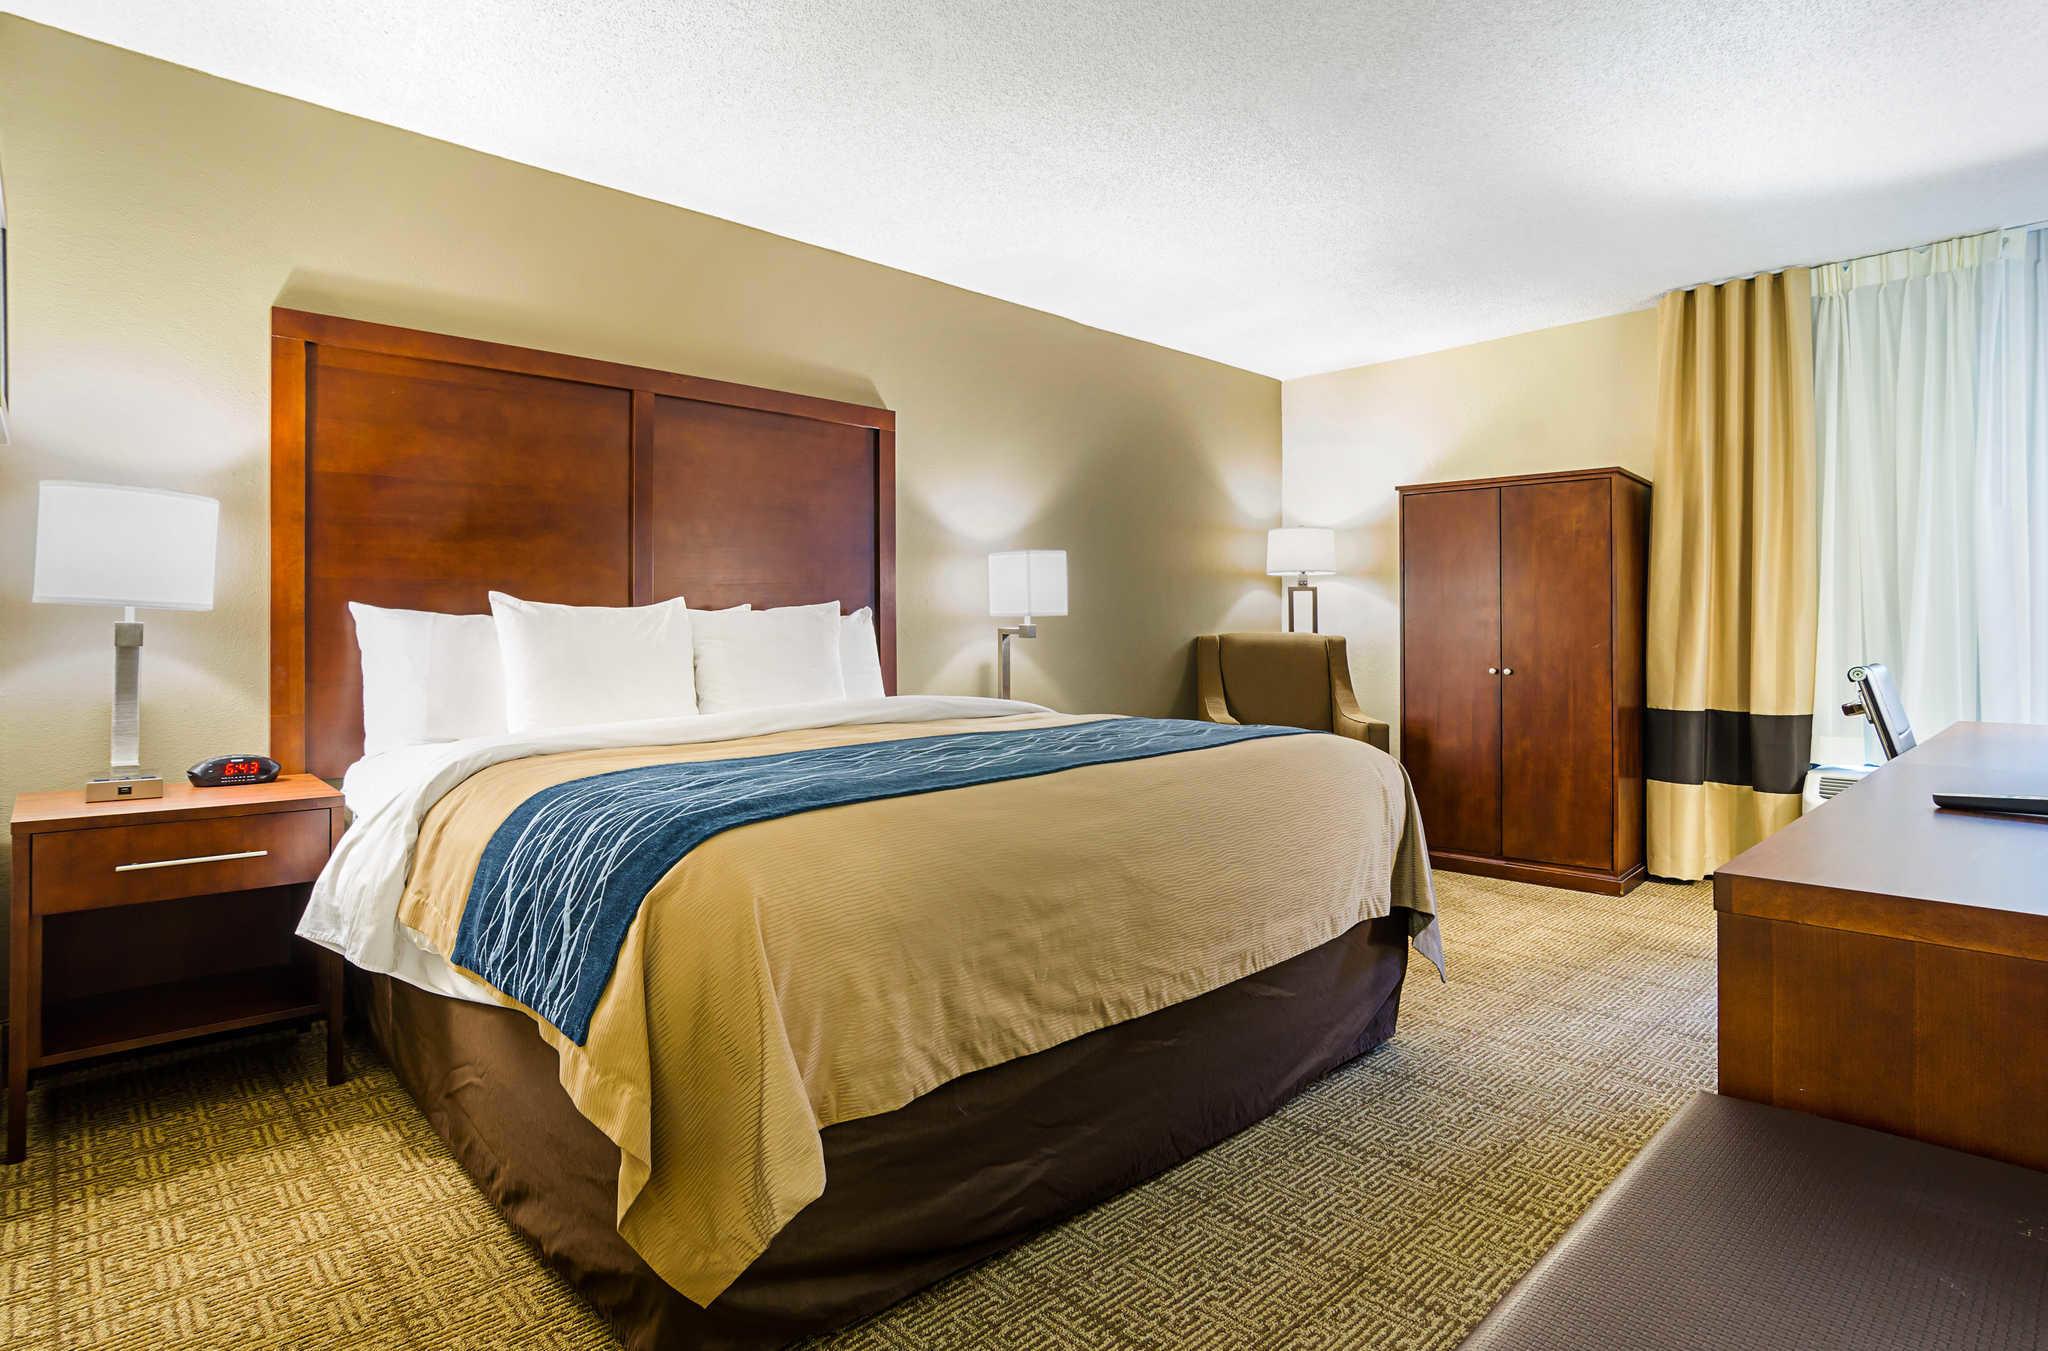 Comfort Inn & Suites Duke University-Downtown image 14